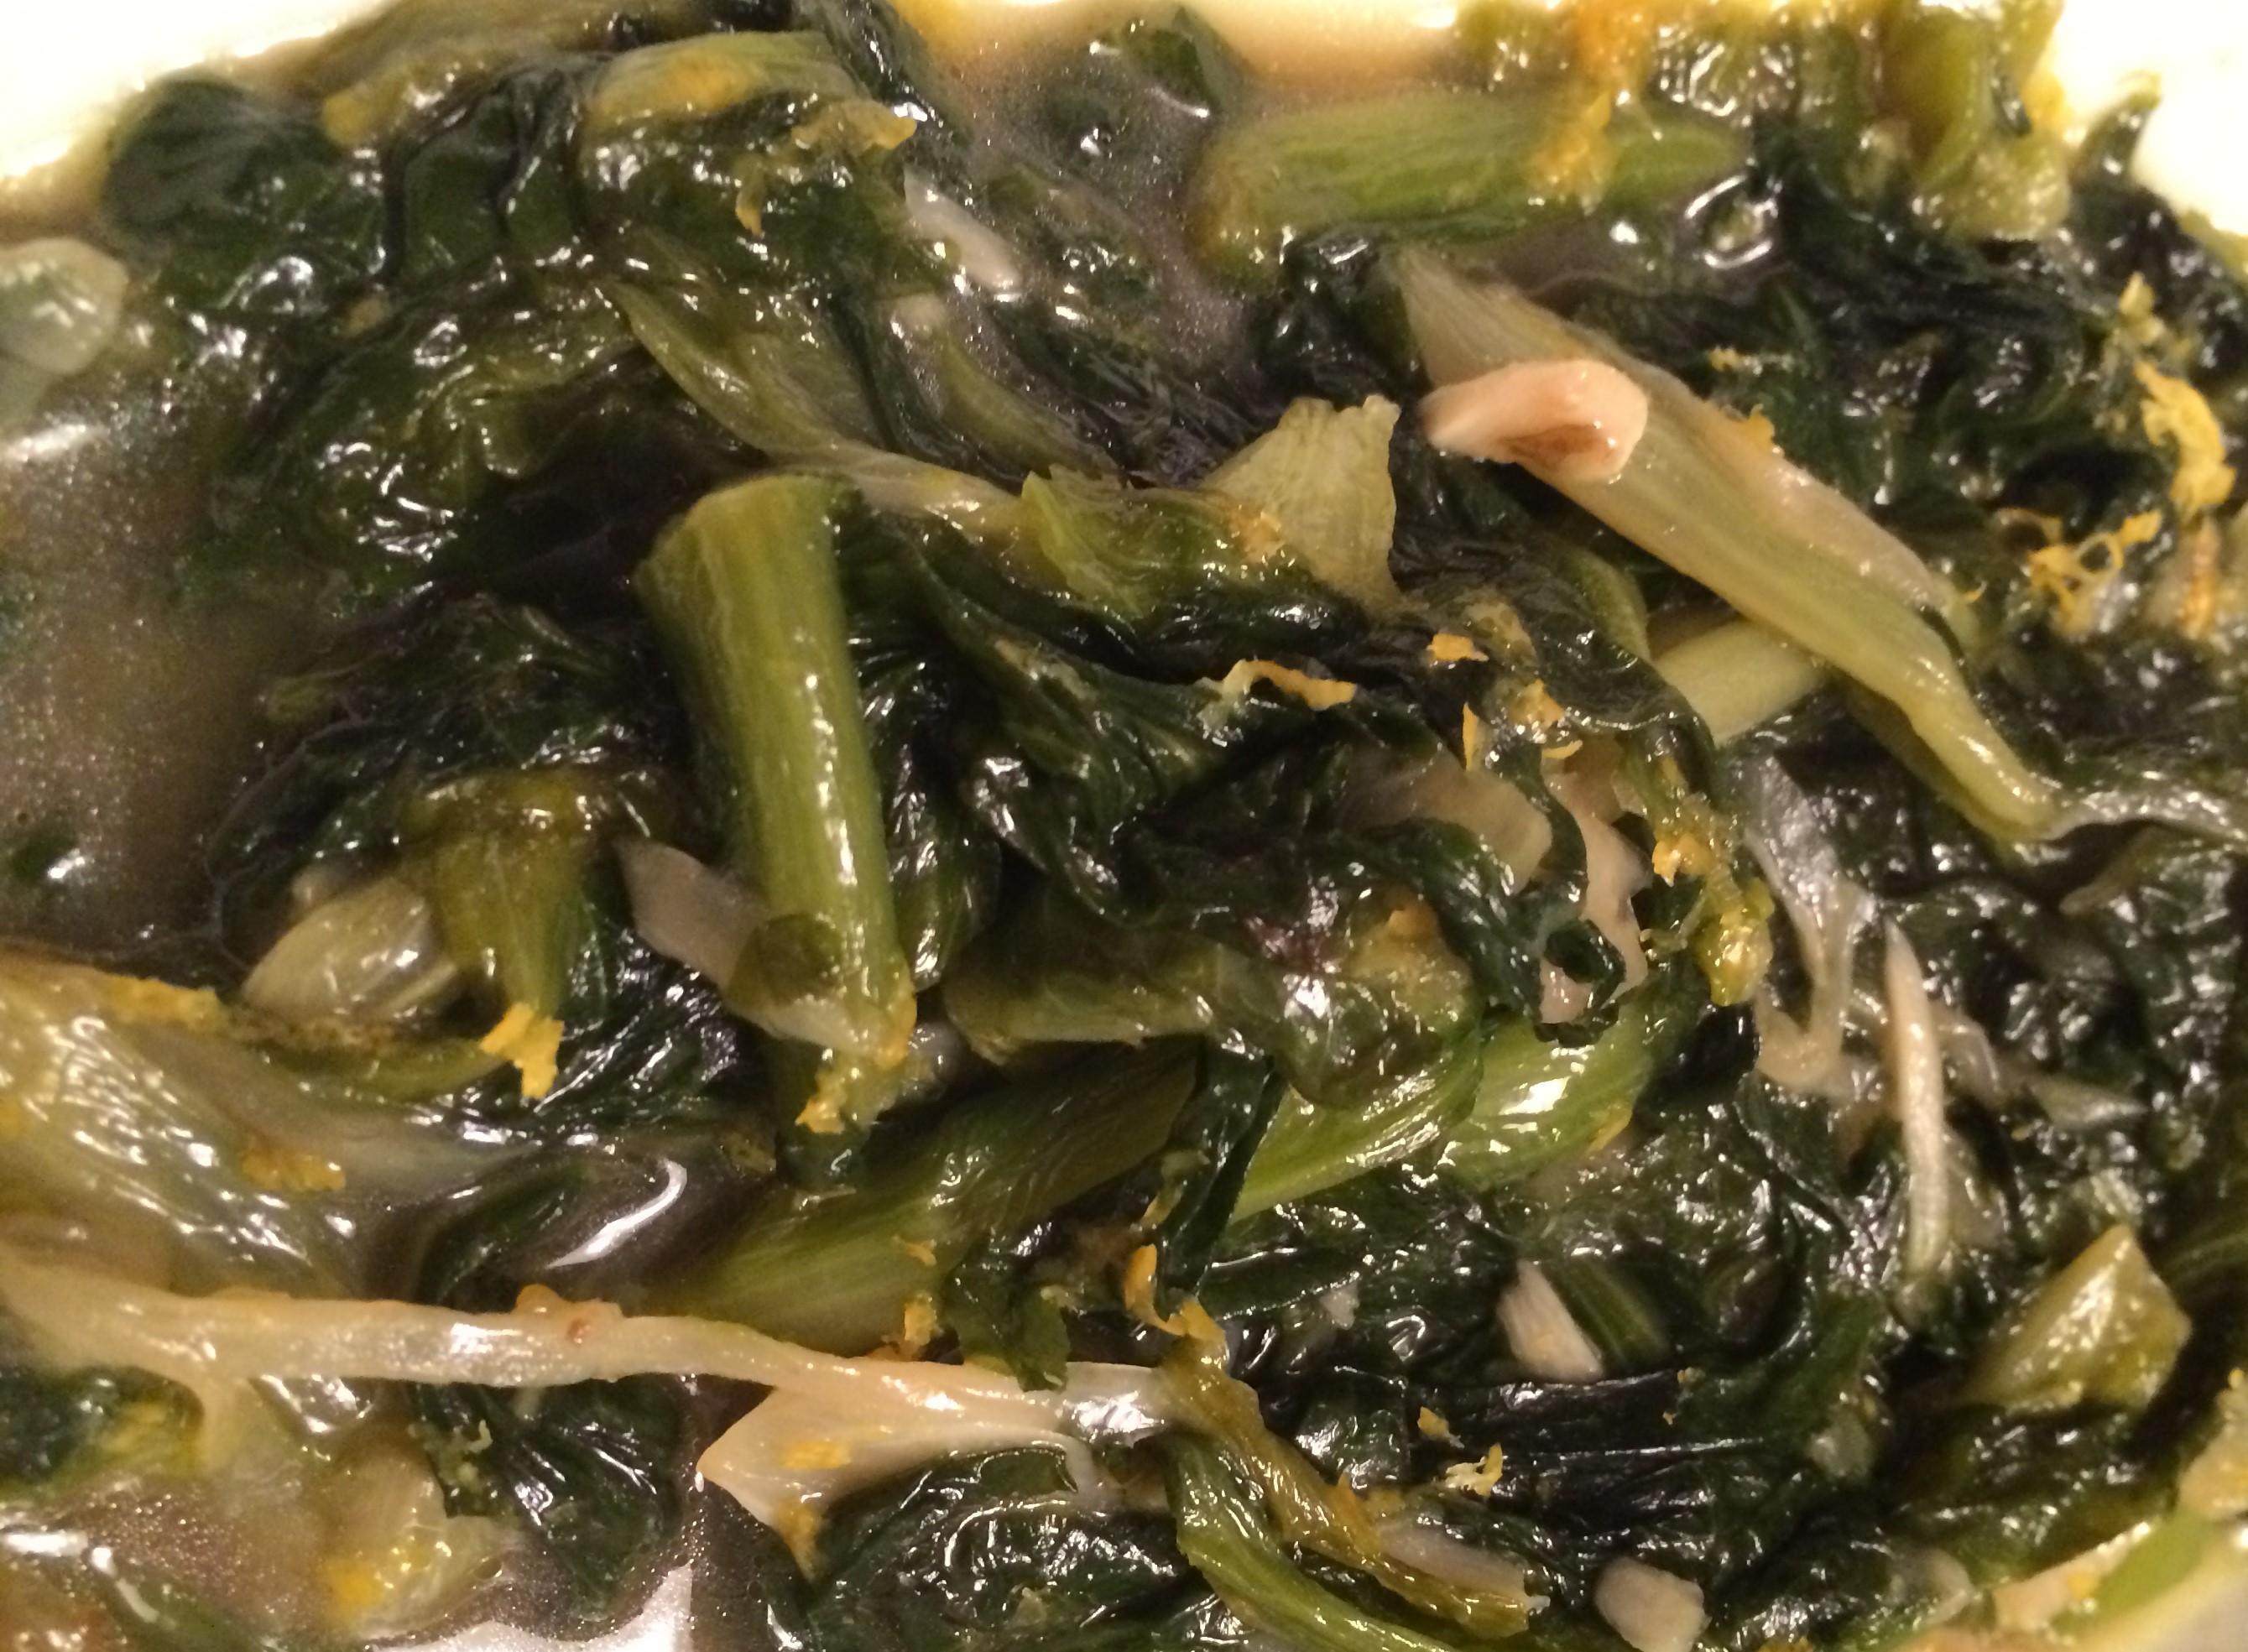 Braised Escarole with Onion, Garlic, and Lemon Zest